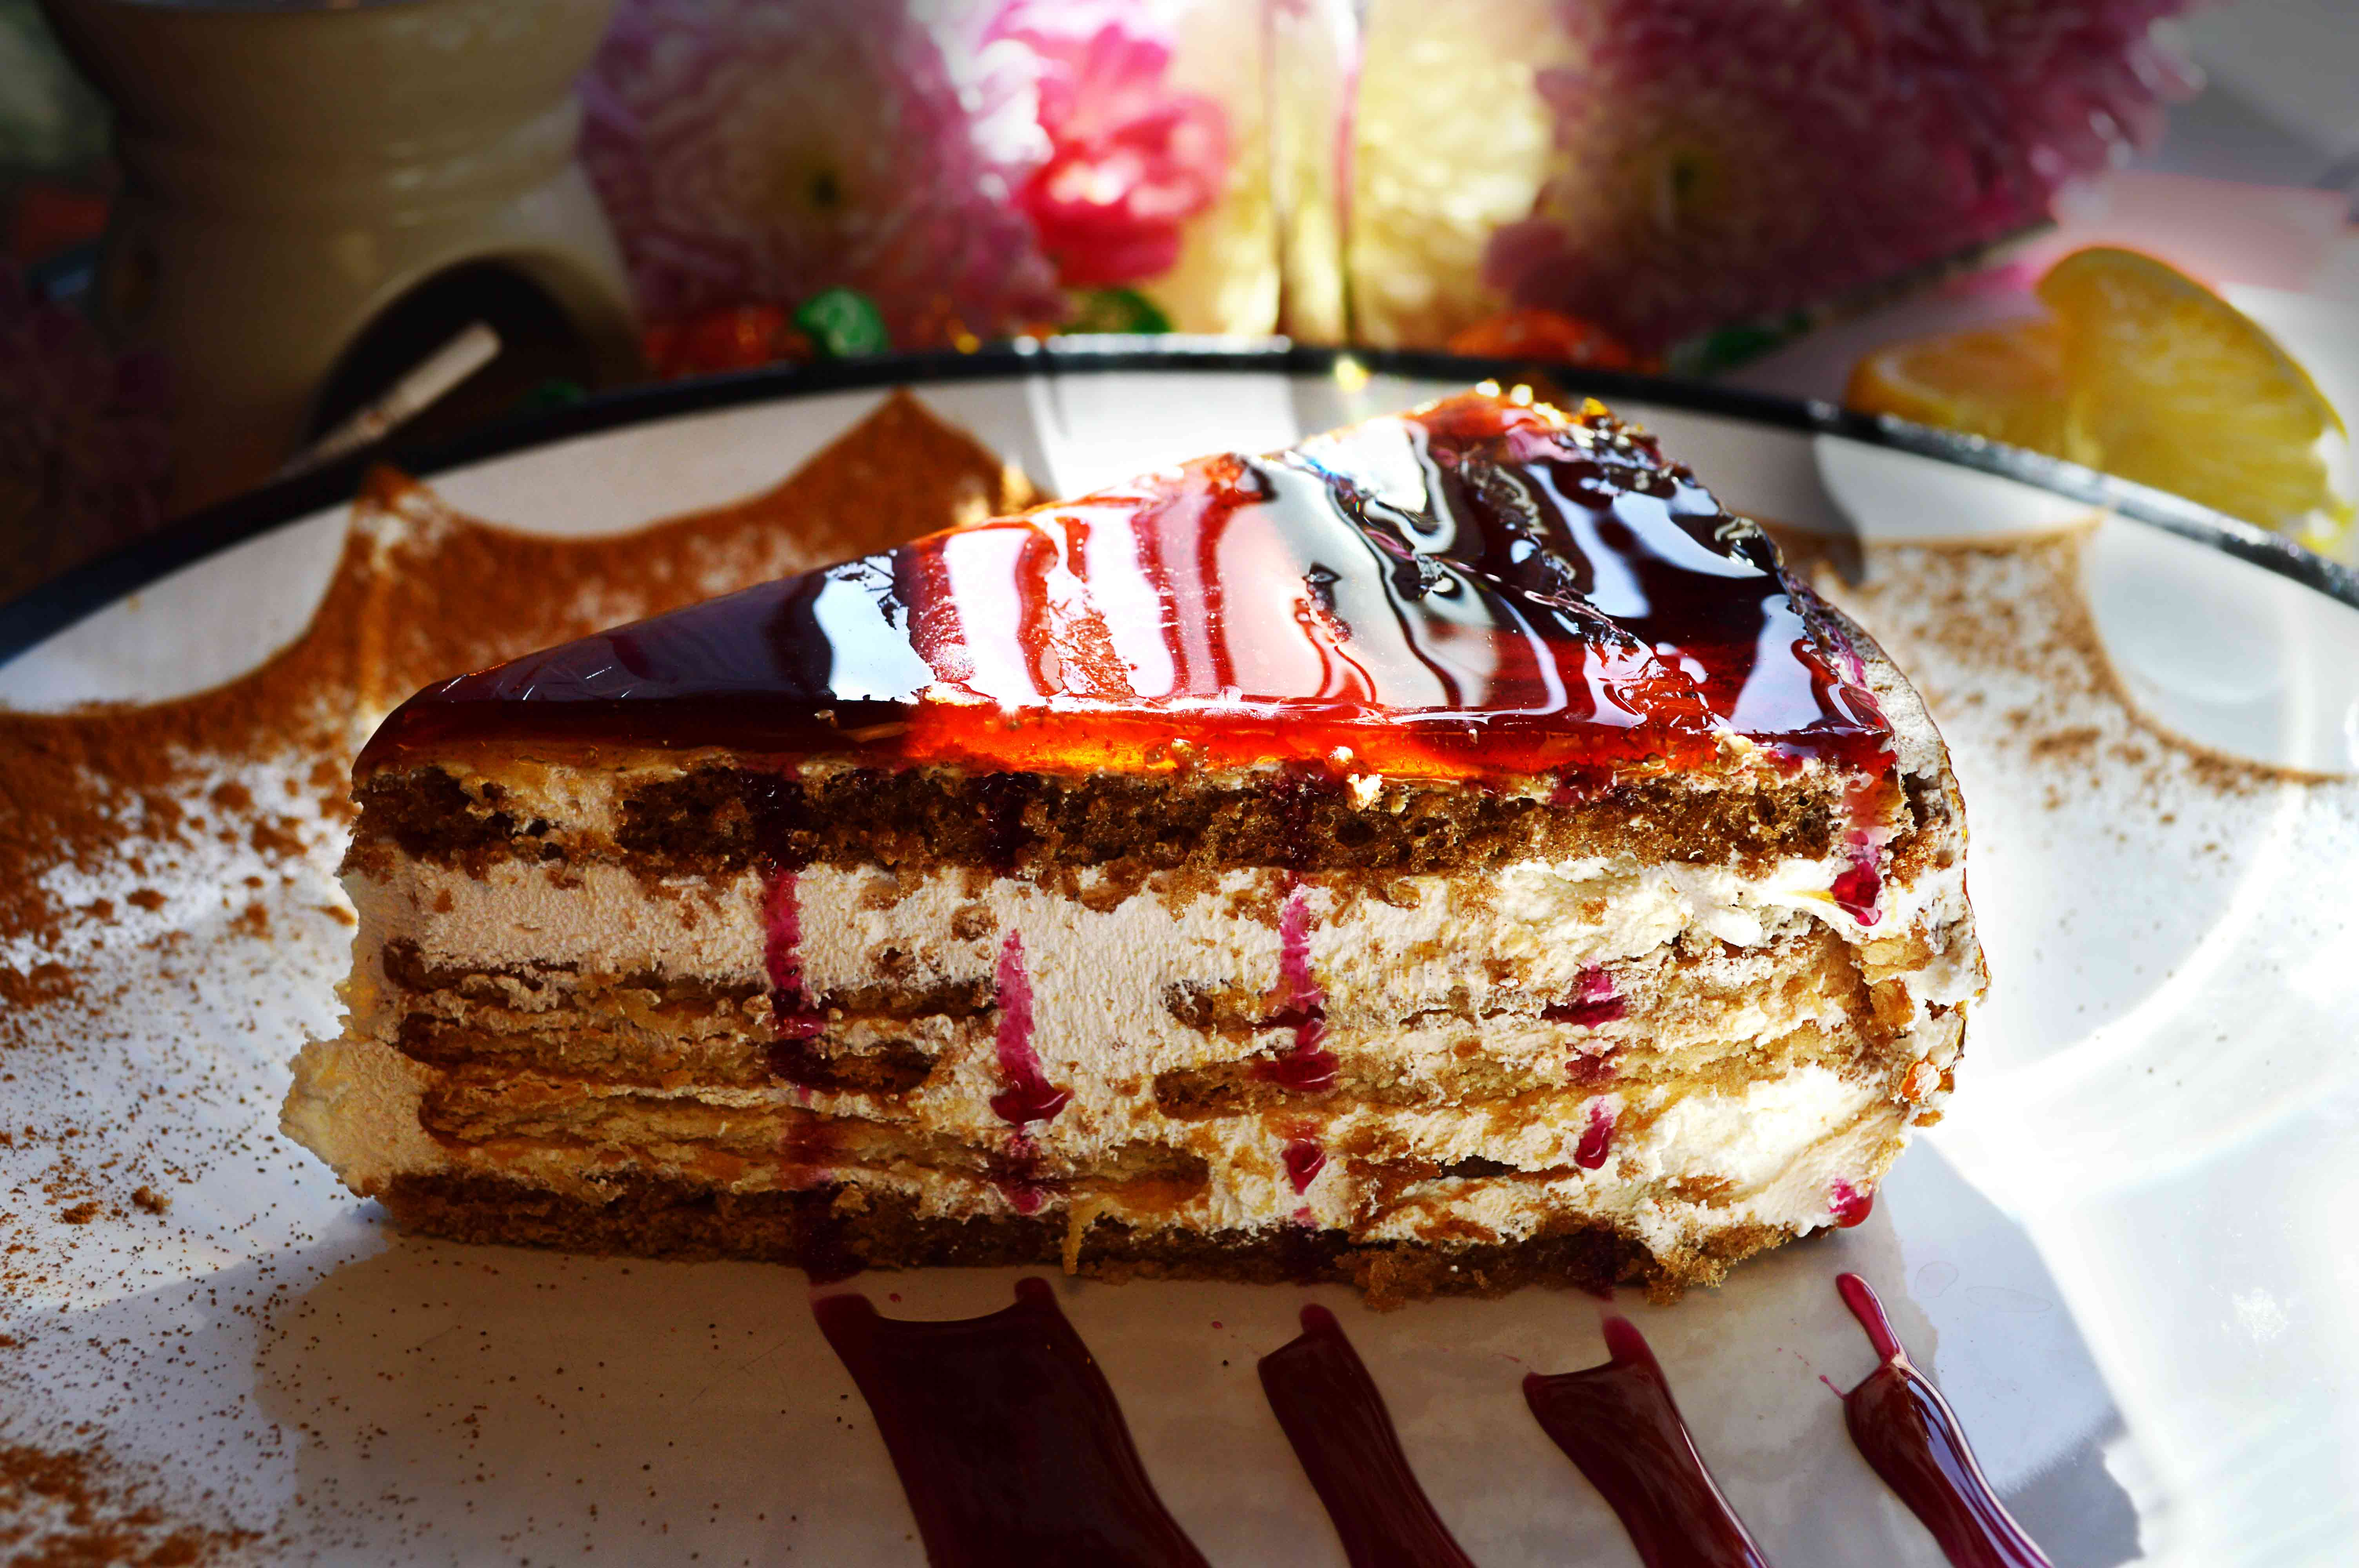 Carawlo Dessert